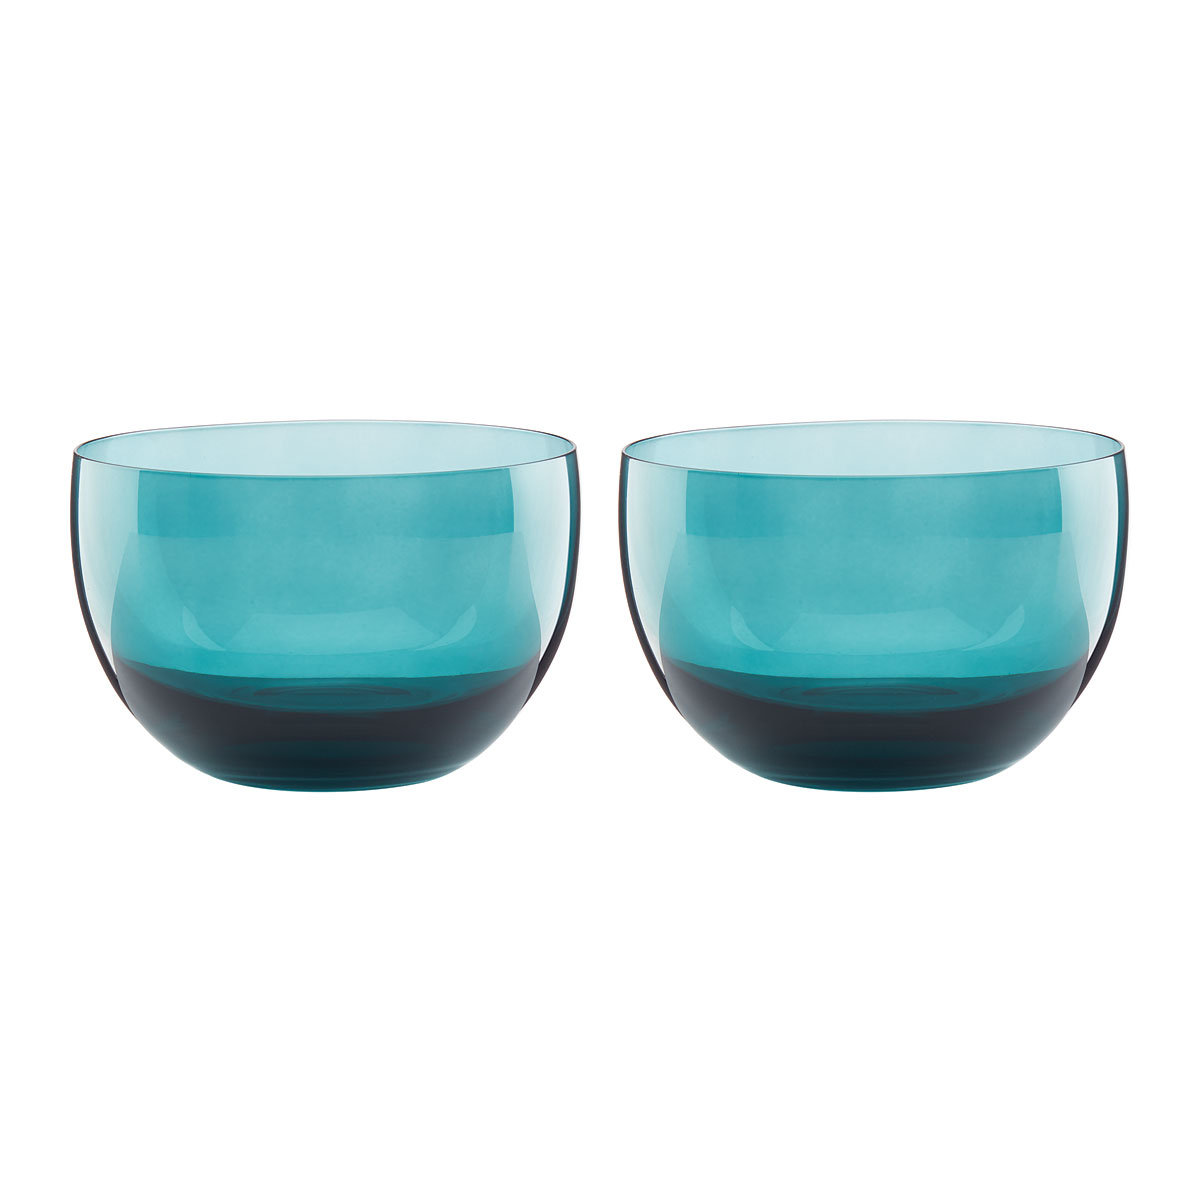 Lenox Sprig And Vine Dinnerware Glass Dip Bowl Turquoise Pair